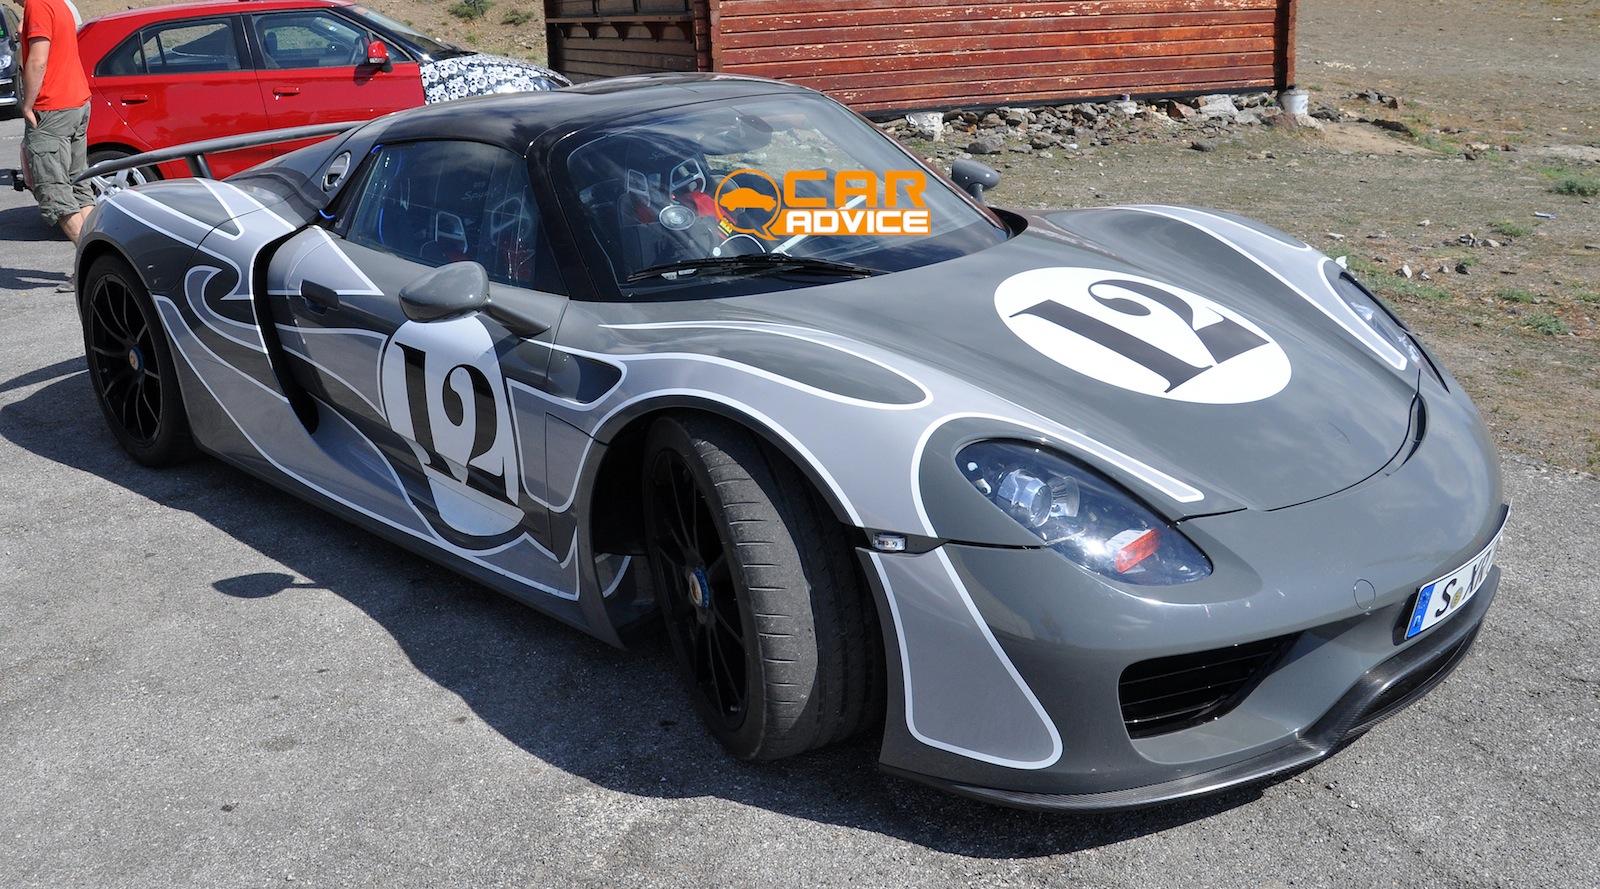 Porsche 918 Spyder Martini Racing Livery Unveiled